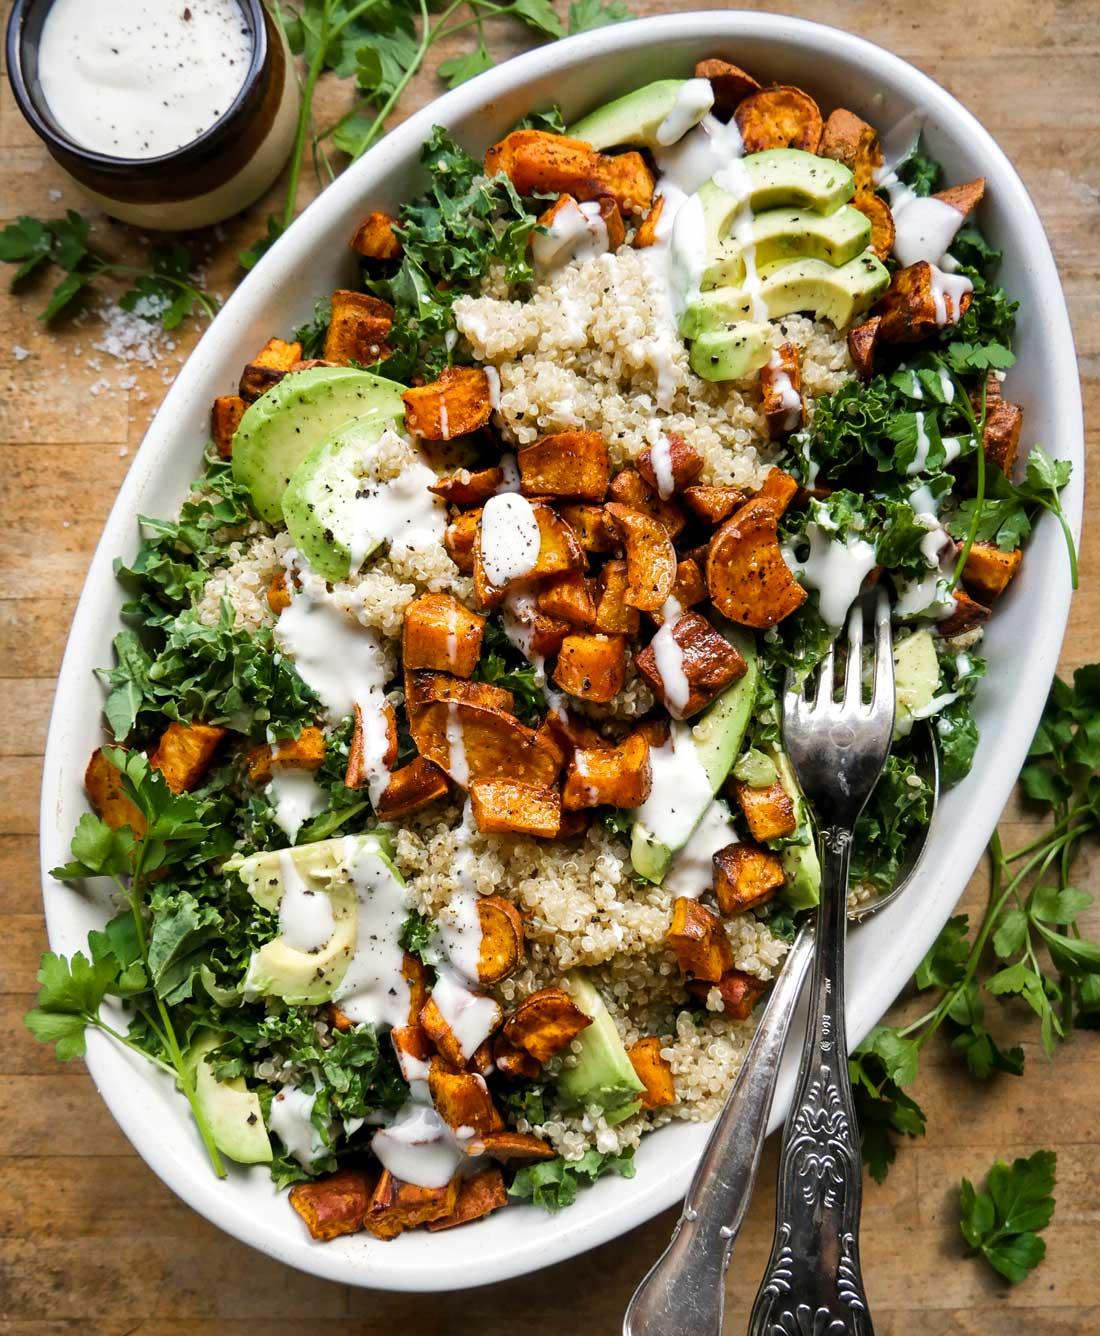 quinoa salat med grønkål, avocado og søde kartofler